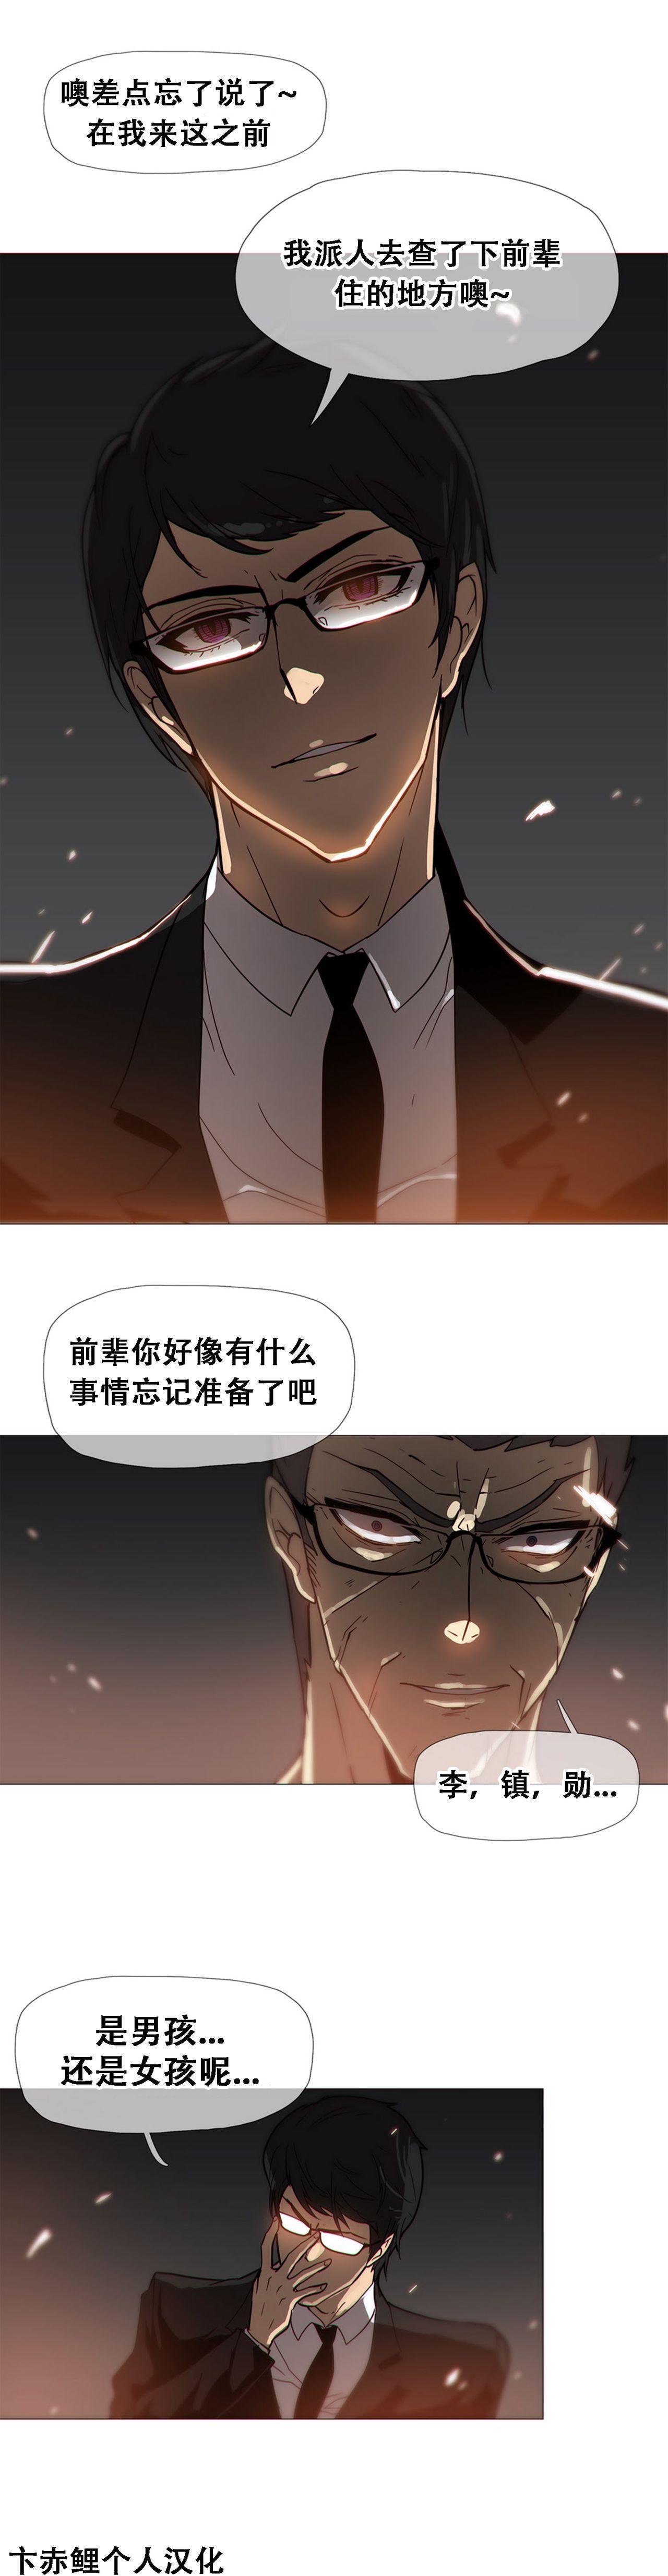 HouseHold Affairs 【卞赤鲤个人汉化】1~33话(持续更新中) 371